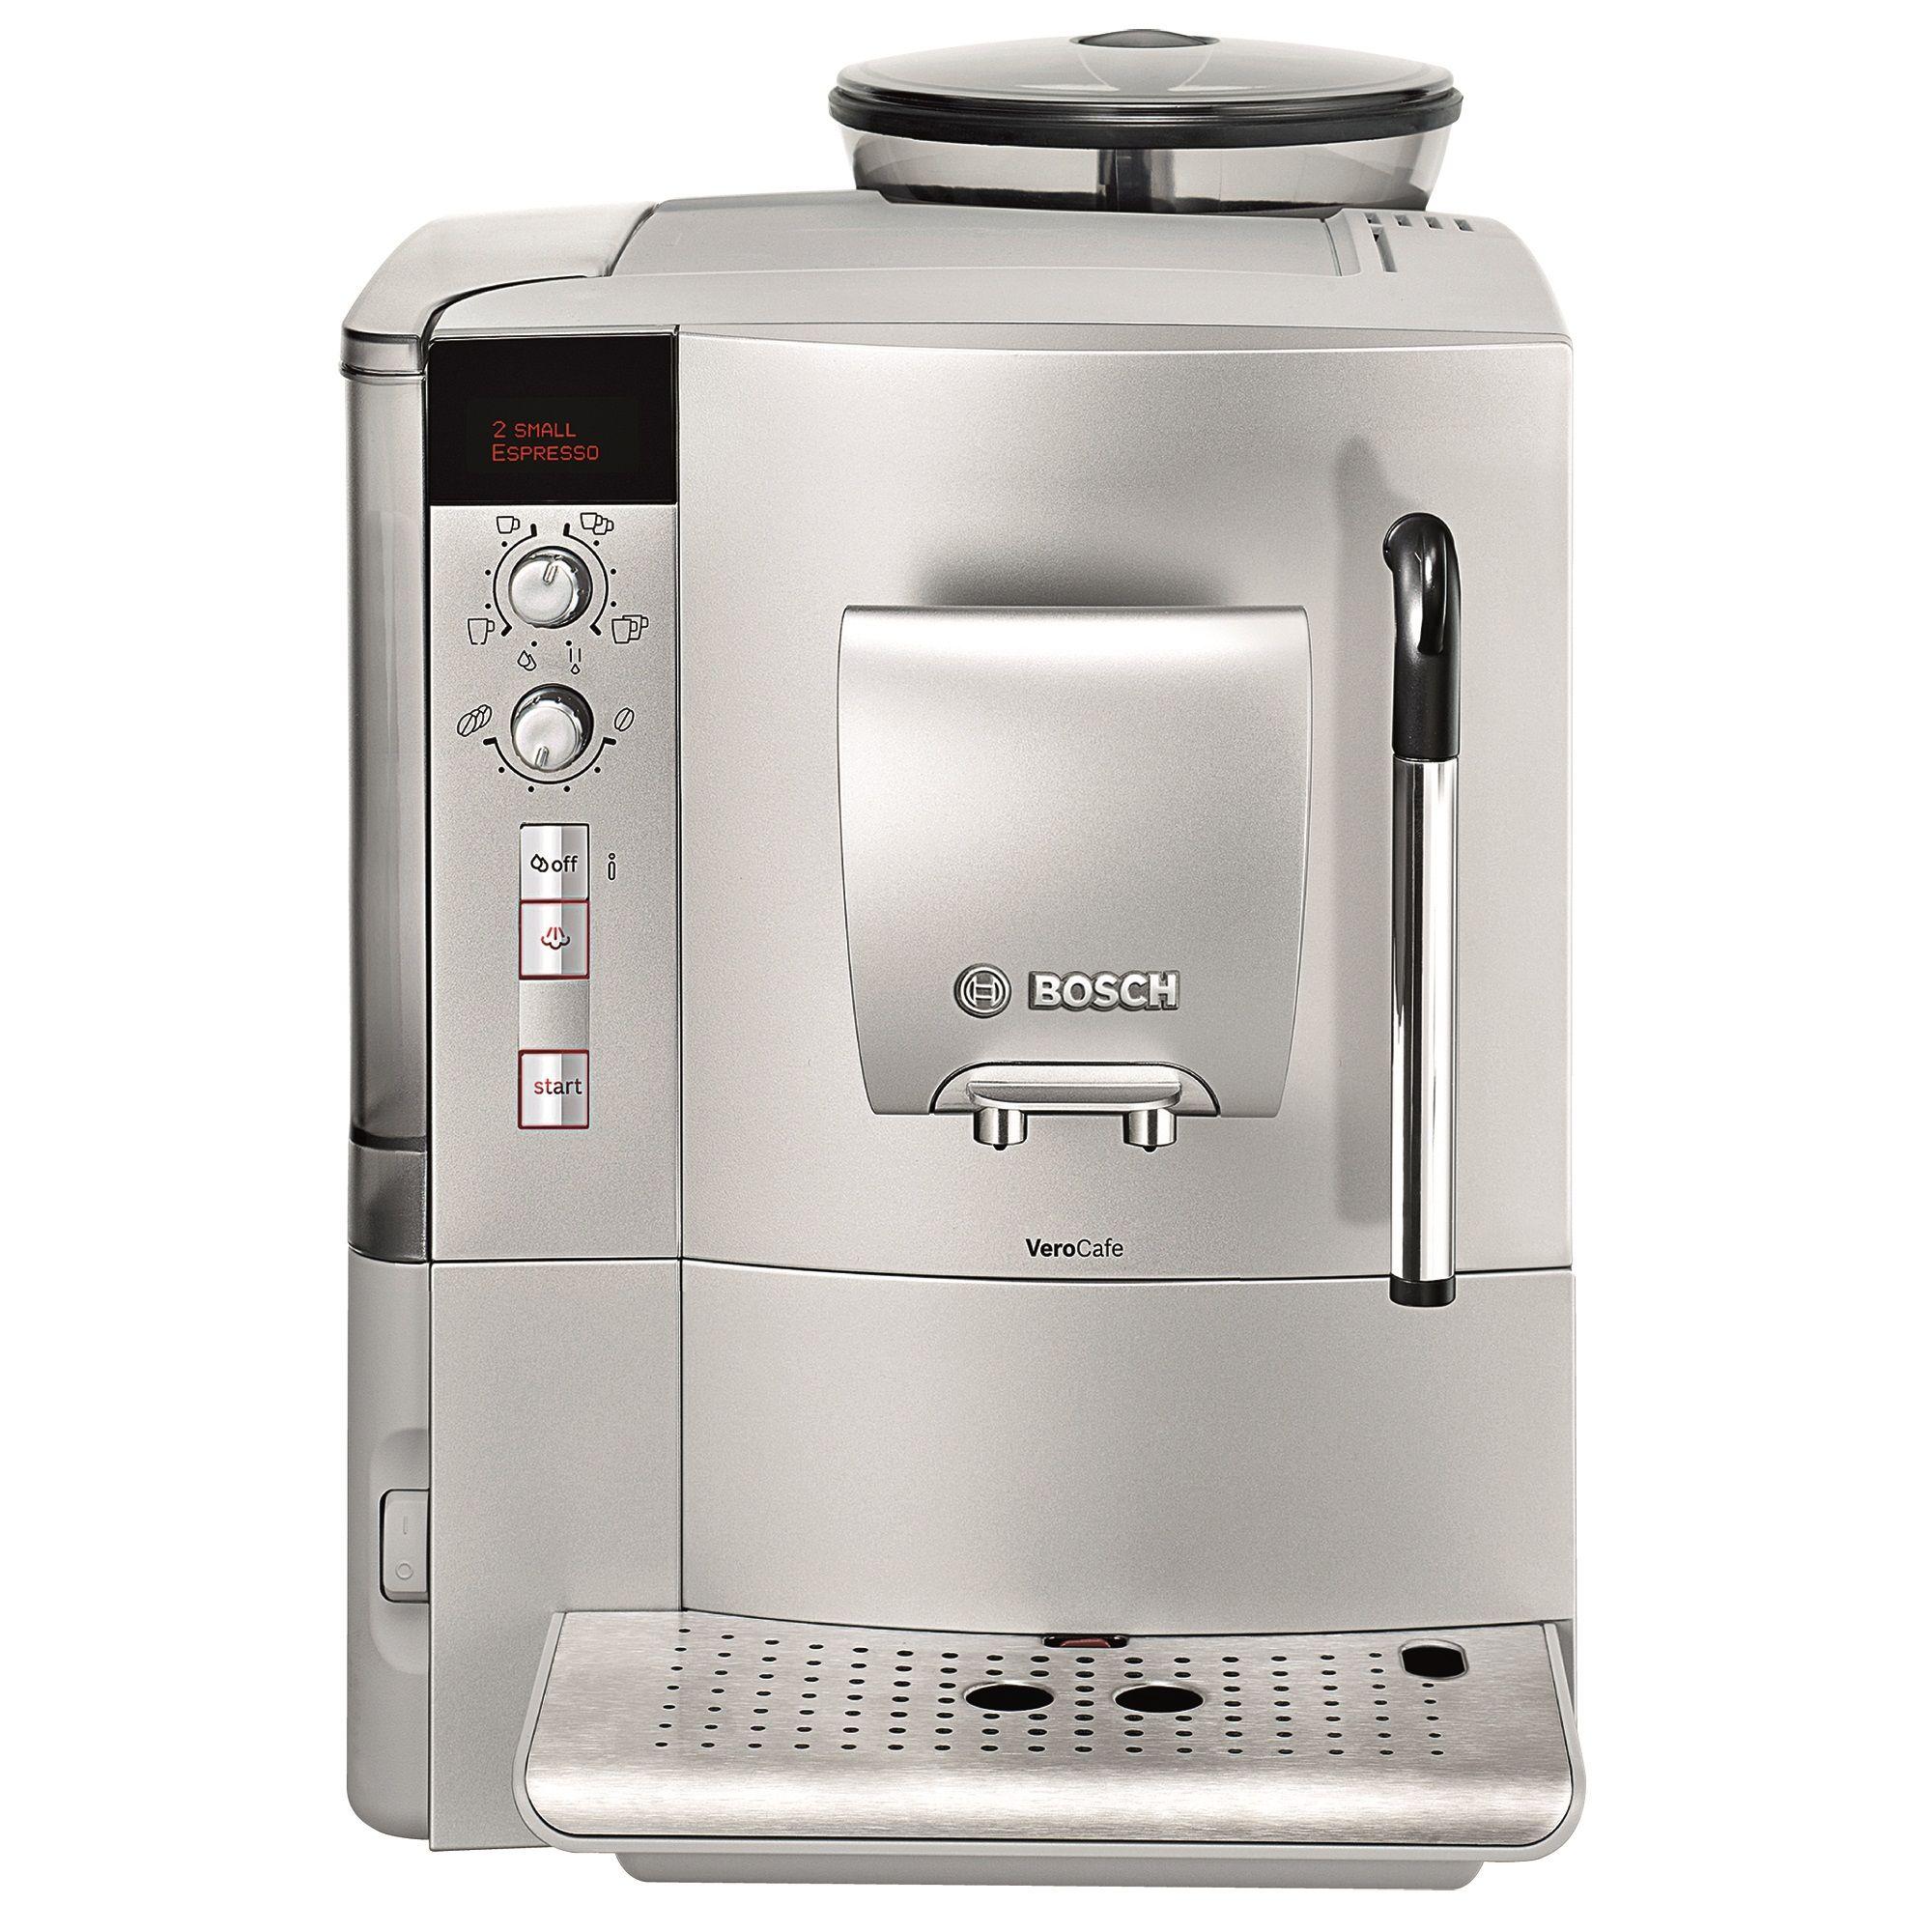 Espressor automat Bosch VeroCafe